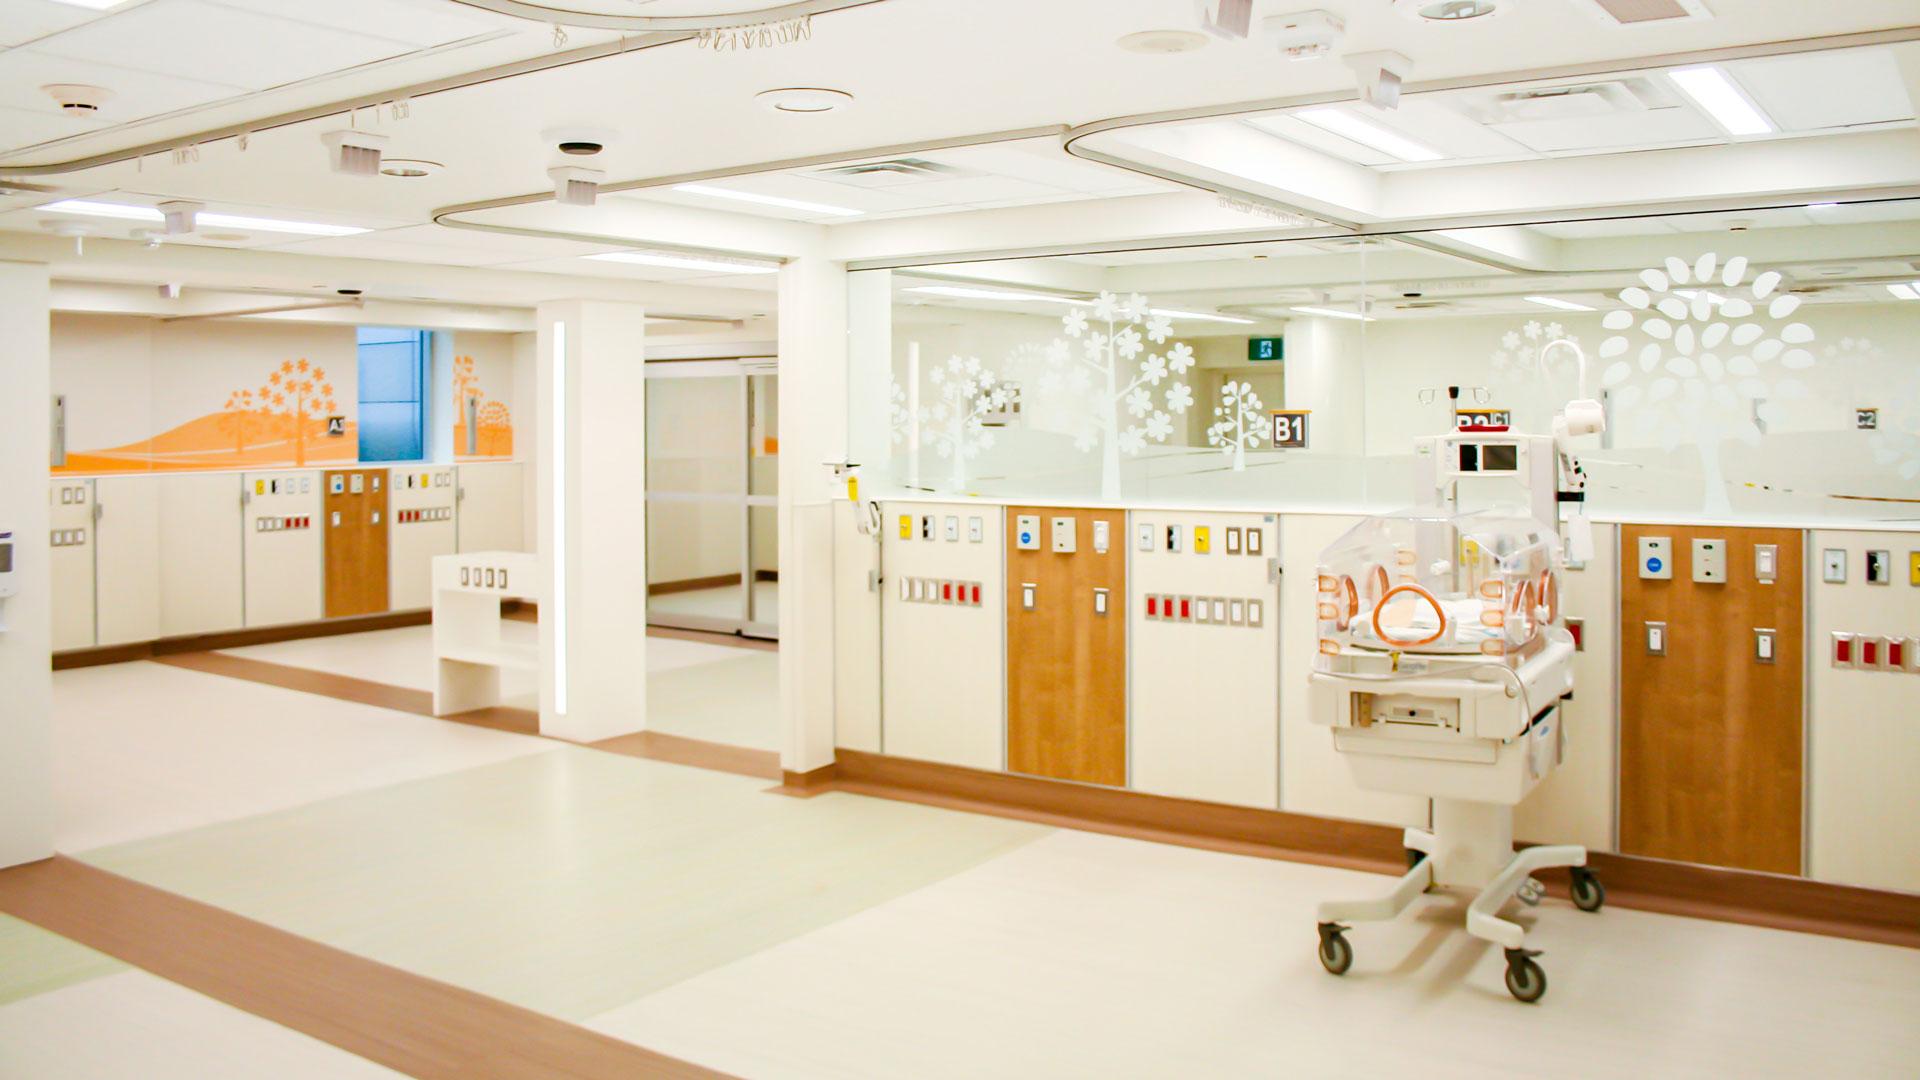 Interior photo of the NICU